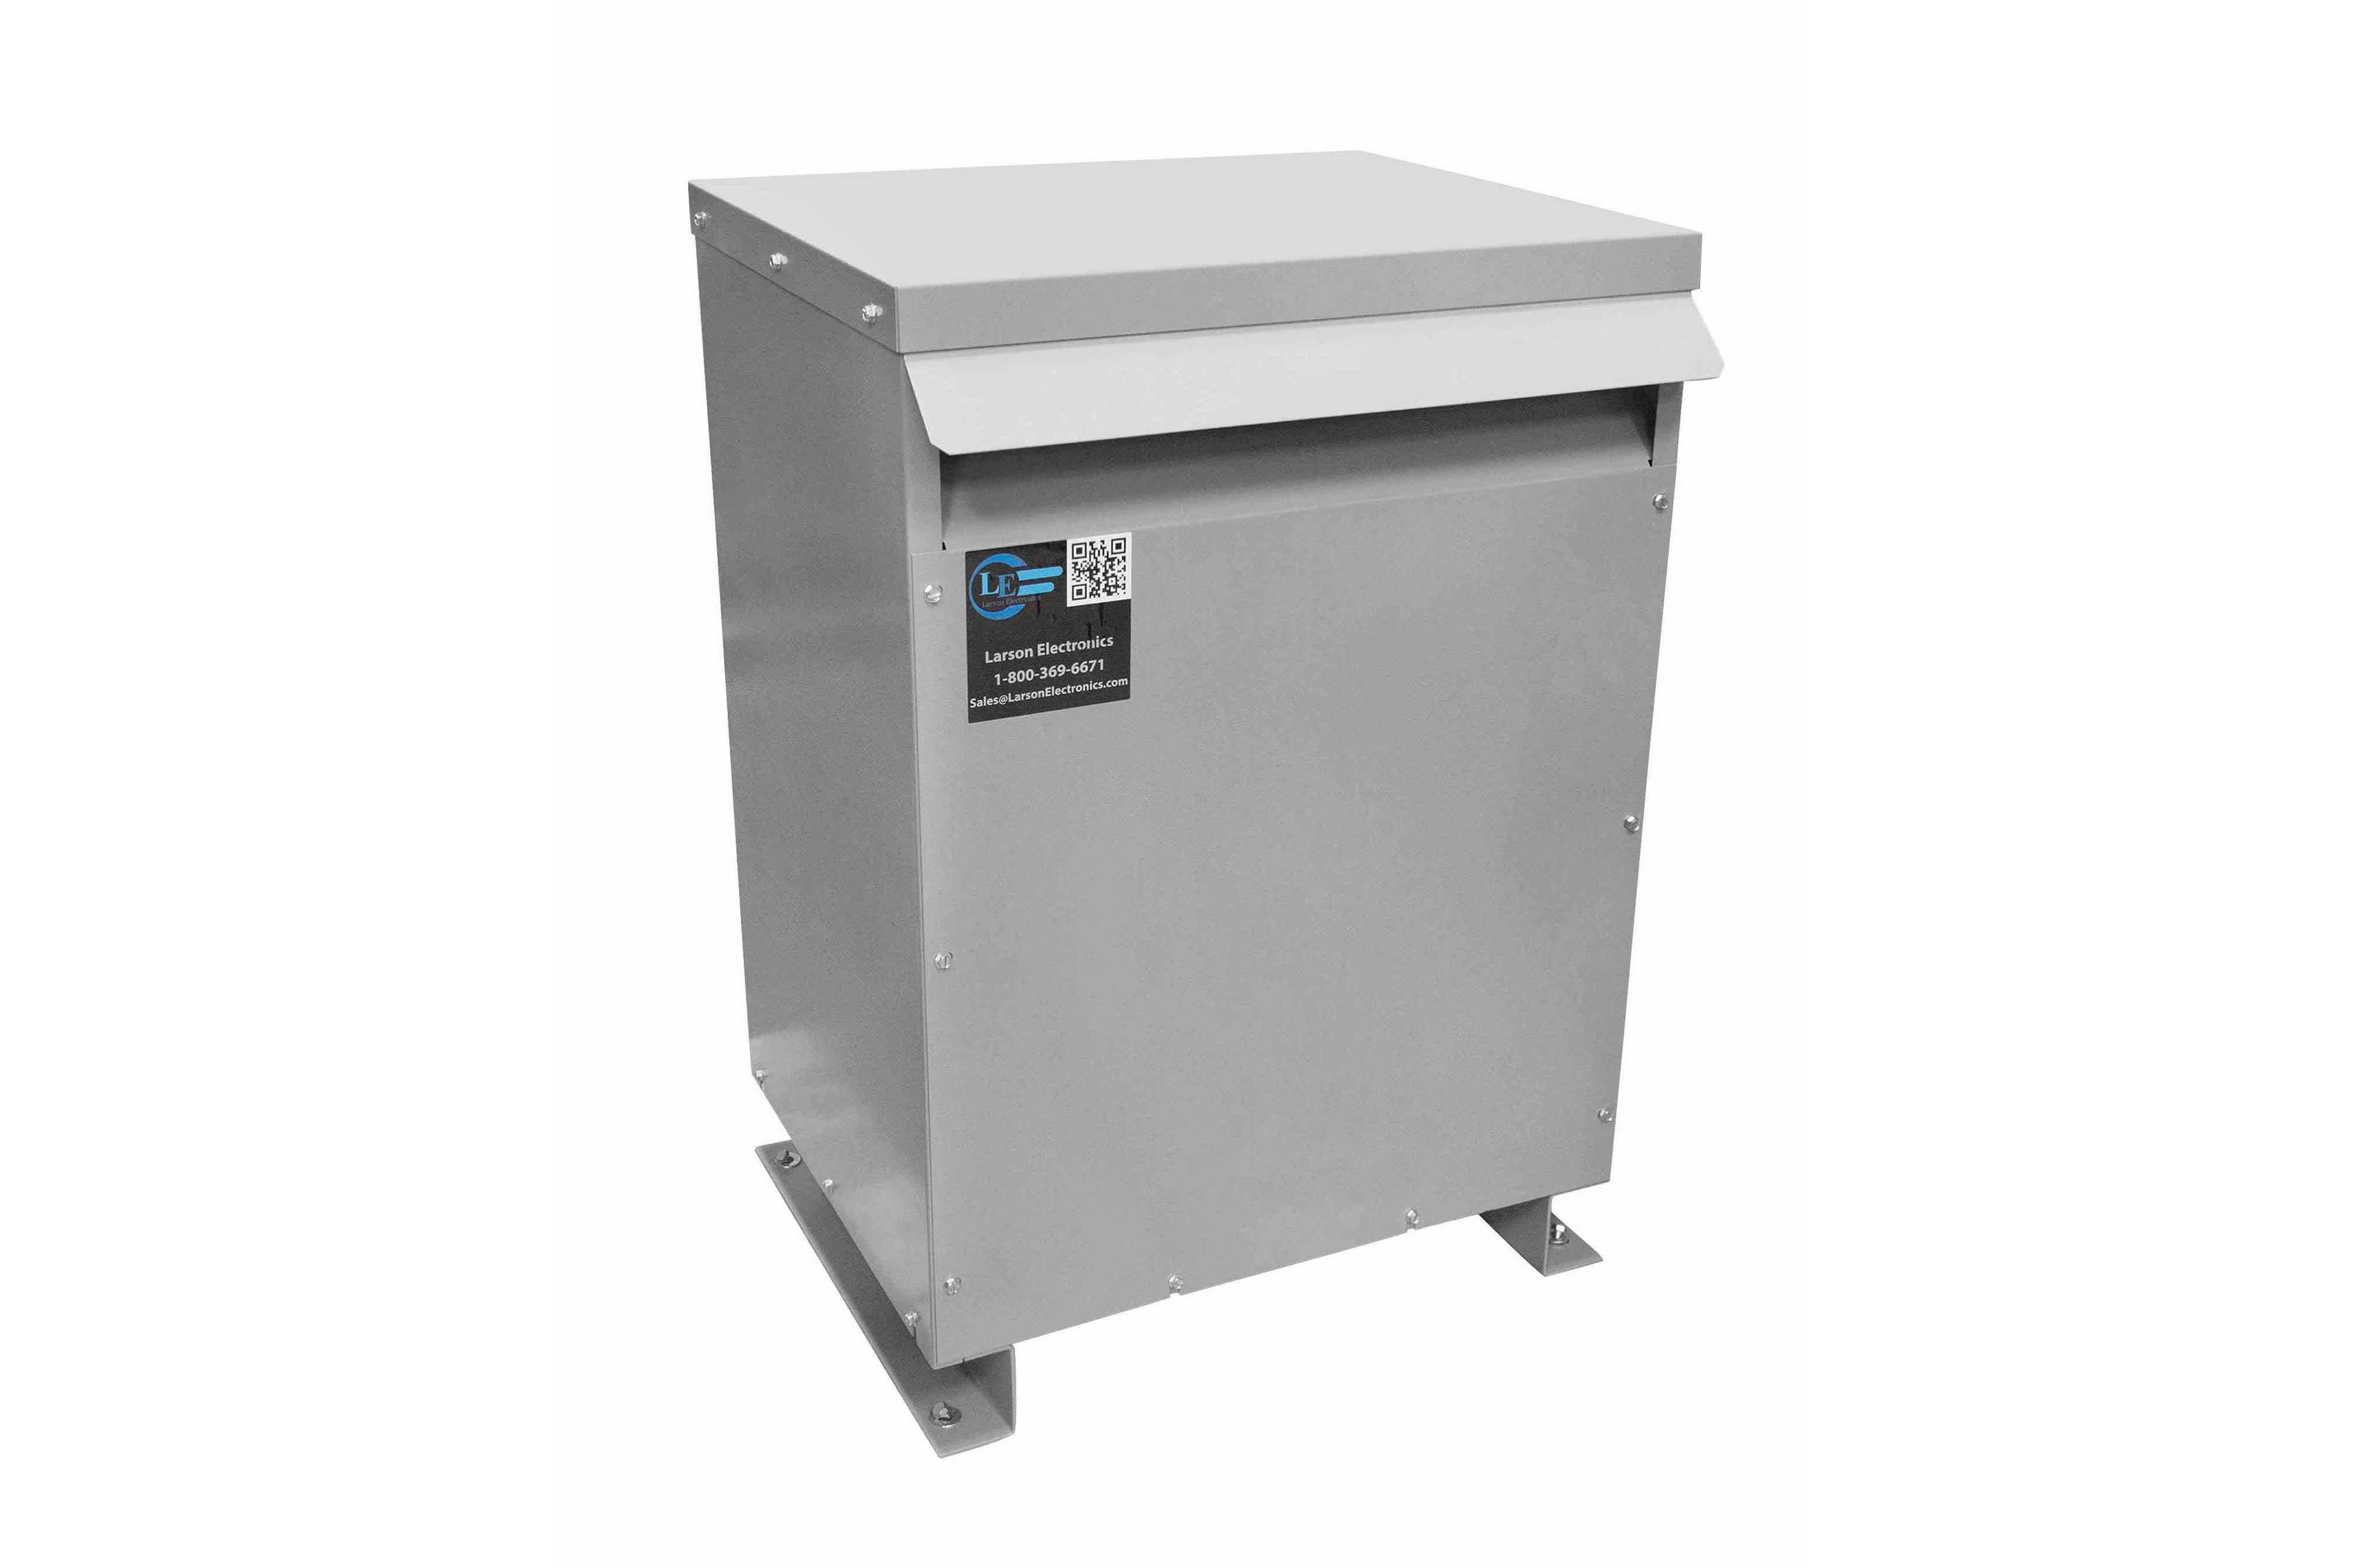 25 kVA 3PH Isolation Transformer, 600V Wye Primary, 460V Delta Secondary, N3R, Ventilated, 60 Hz